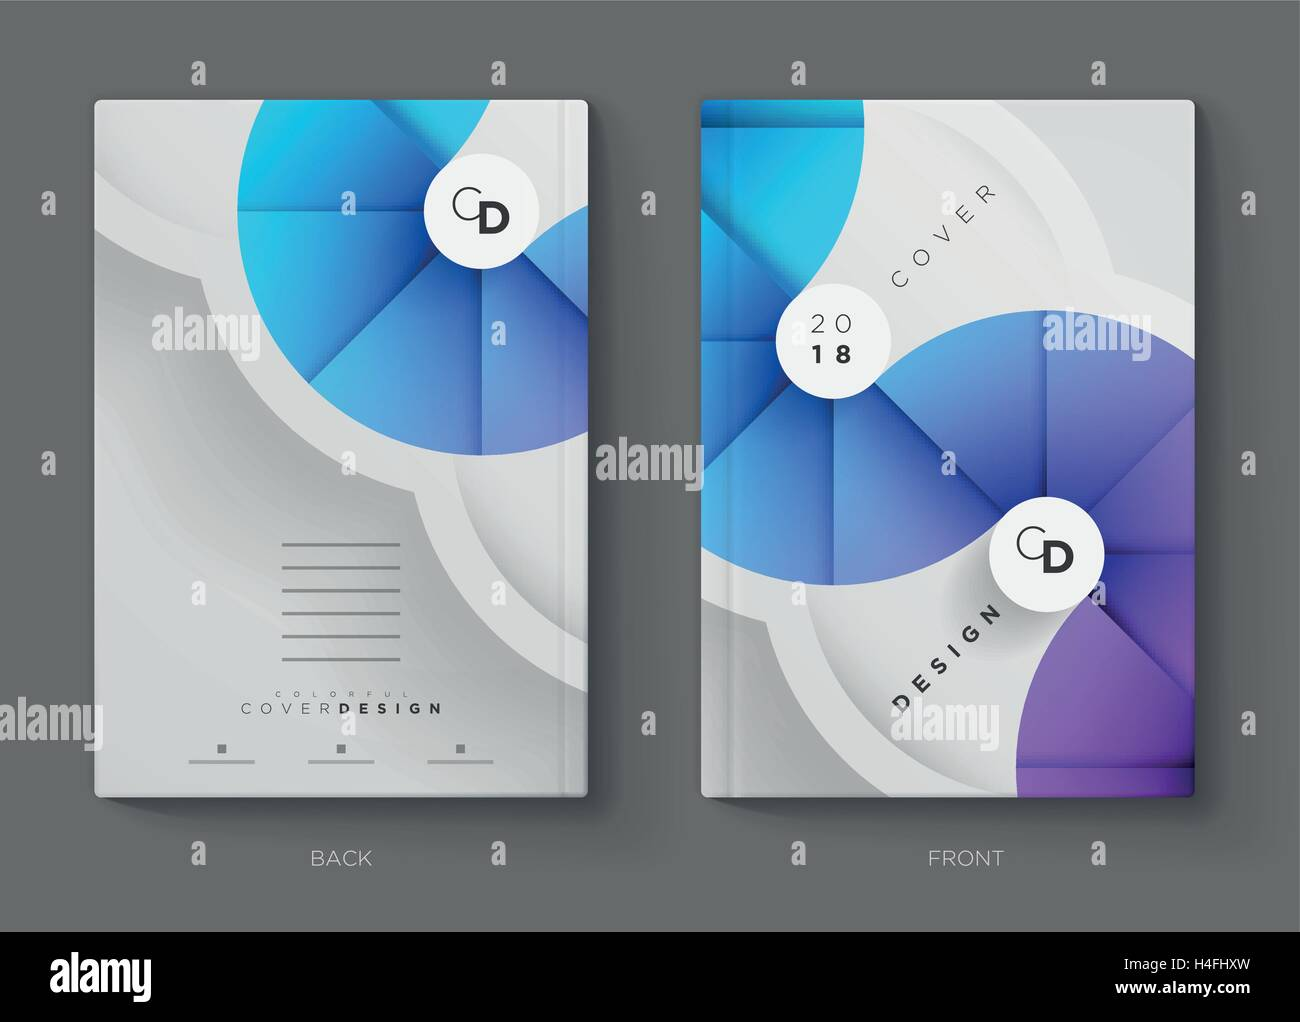 simple layout design